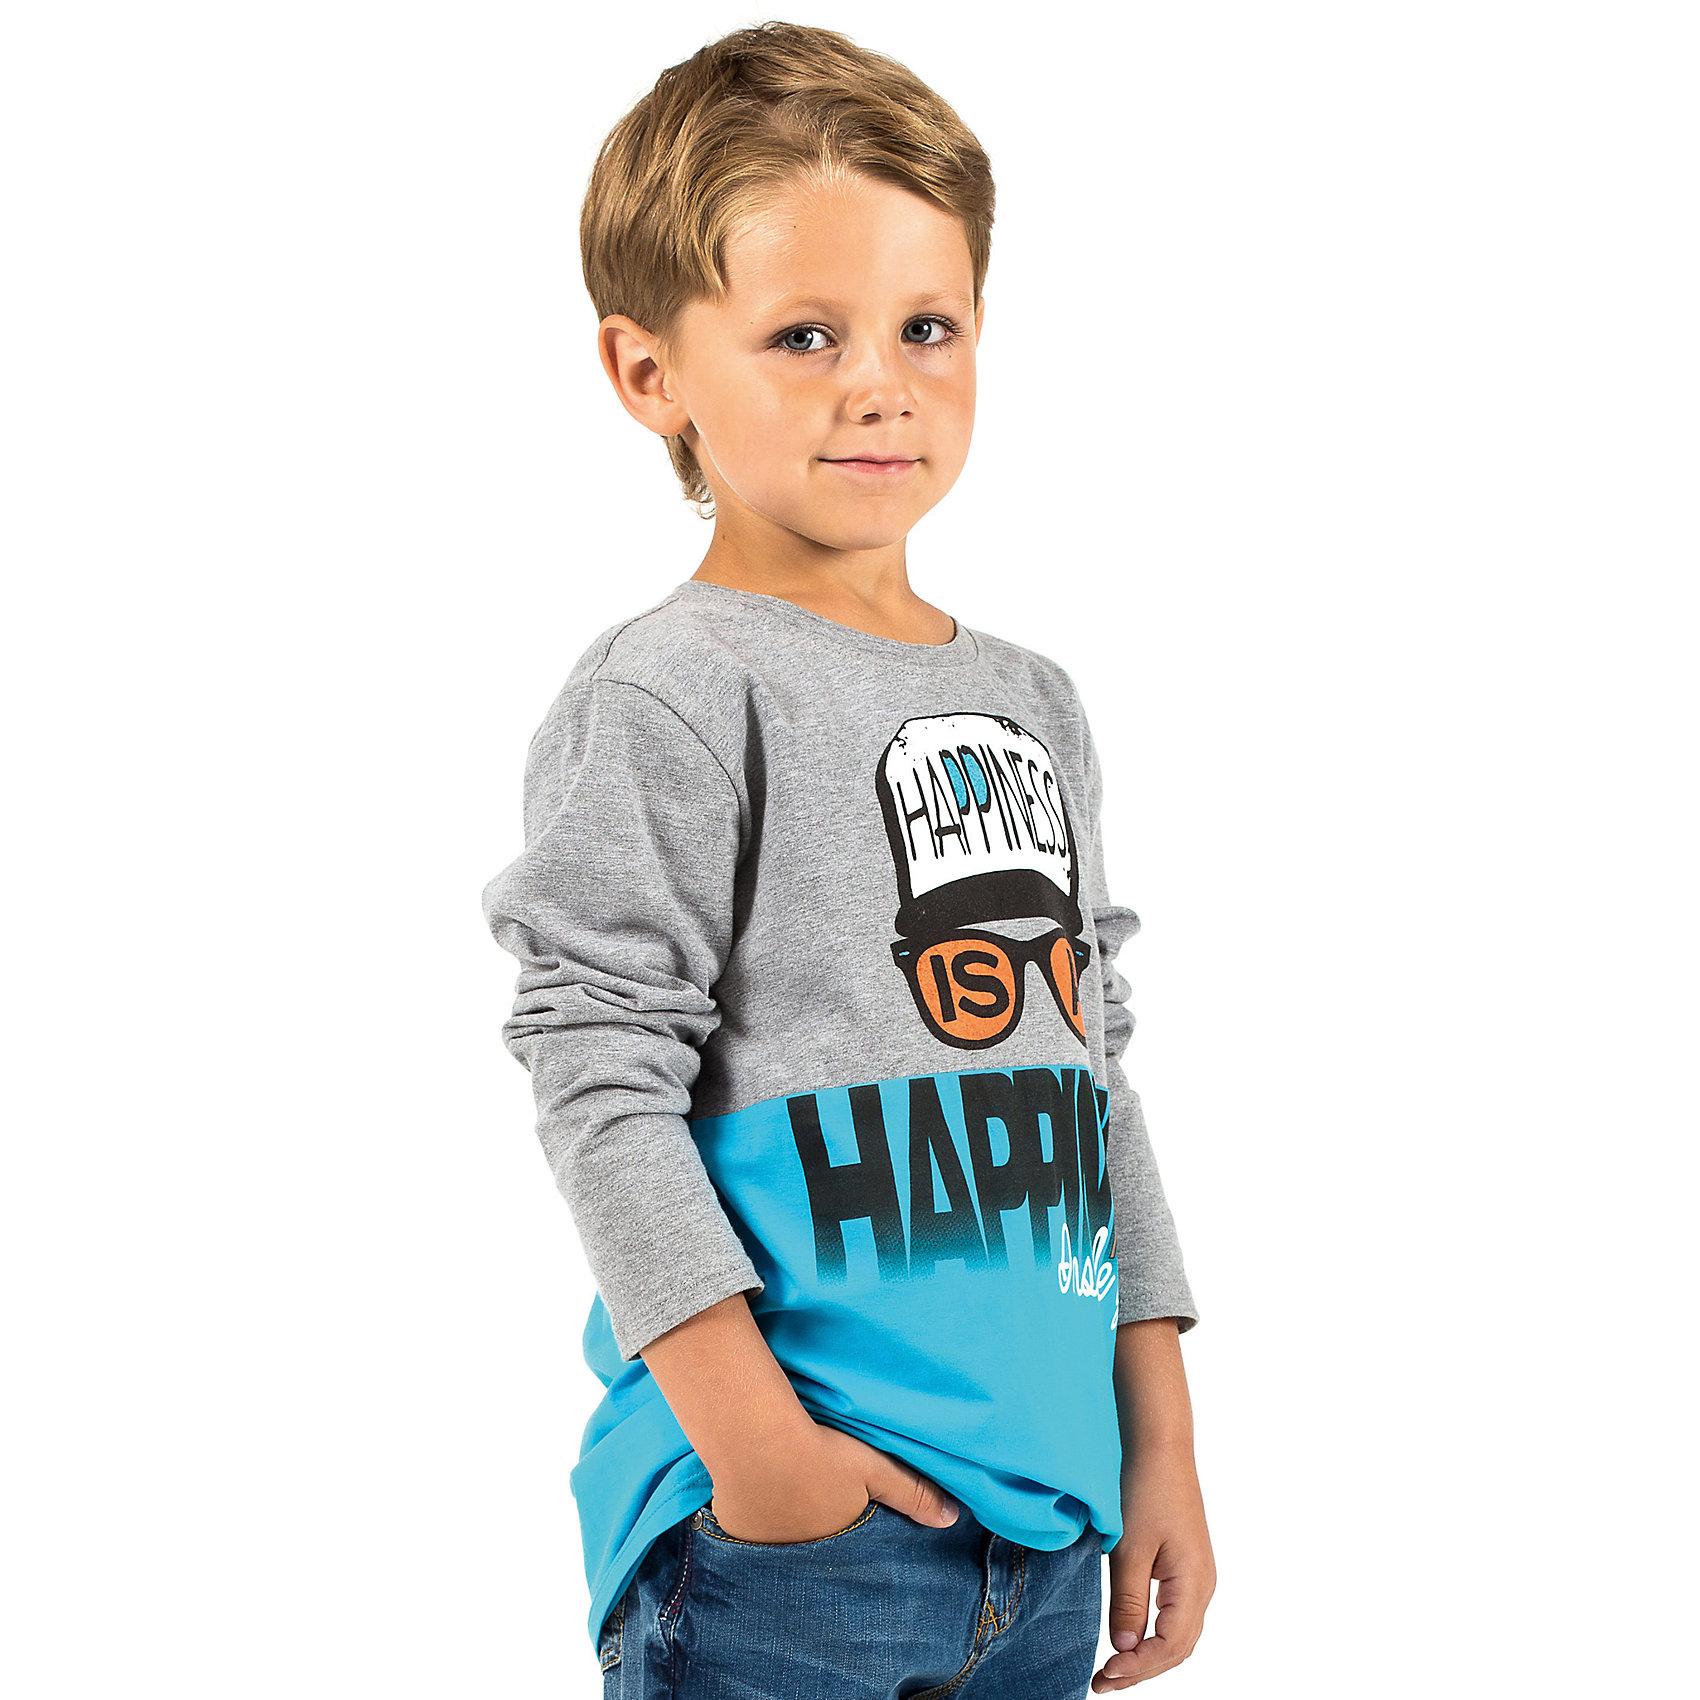 Футболка с длинным рукавом для мальчика WojcikФутболки с длинным рукавом<br>Футболка с длинным рукавом для мальчика Wojcik<br>Состав:<br>Хлопок 92% Эластан 8%<br><br>Ширина мм: 230<br>Глубина мм: 40<br>Высота мм: 220<br>Вес г: 250<br>Цвет: голубой<br>Возраст от месяцев: 84<br>Возраст до месяцев: 96<br>Пол: Мужской<br>Возраст: Детский<br>Размер: 128,92,98,104,110,116,122<br>SKU: 5592189